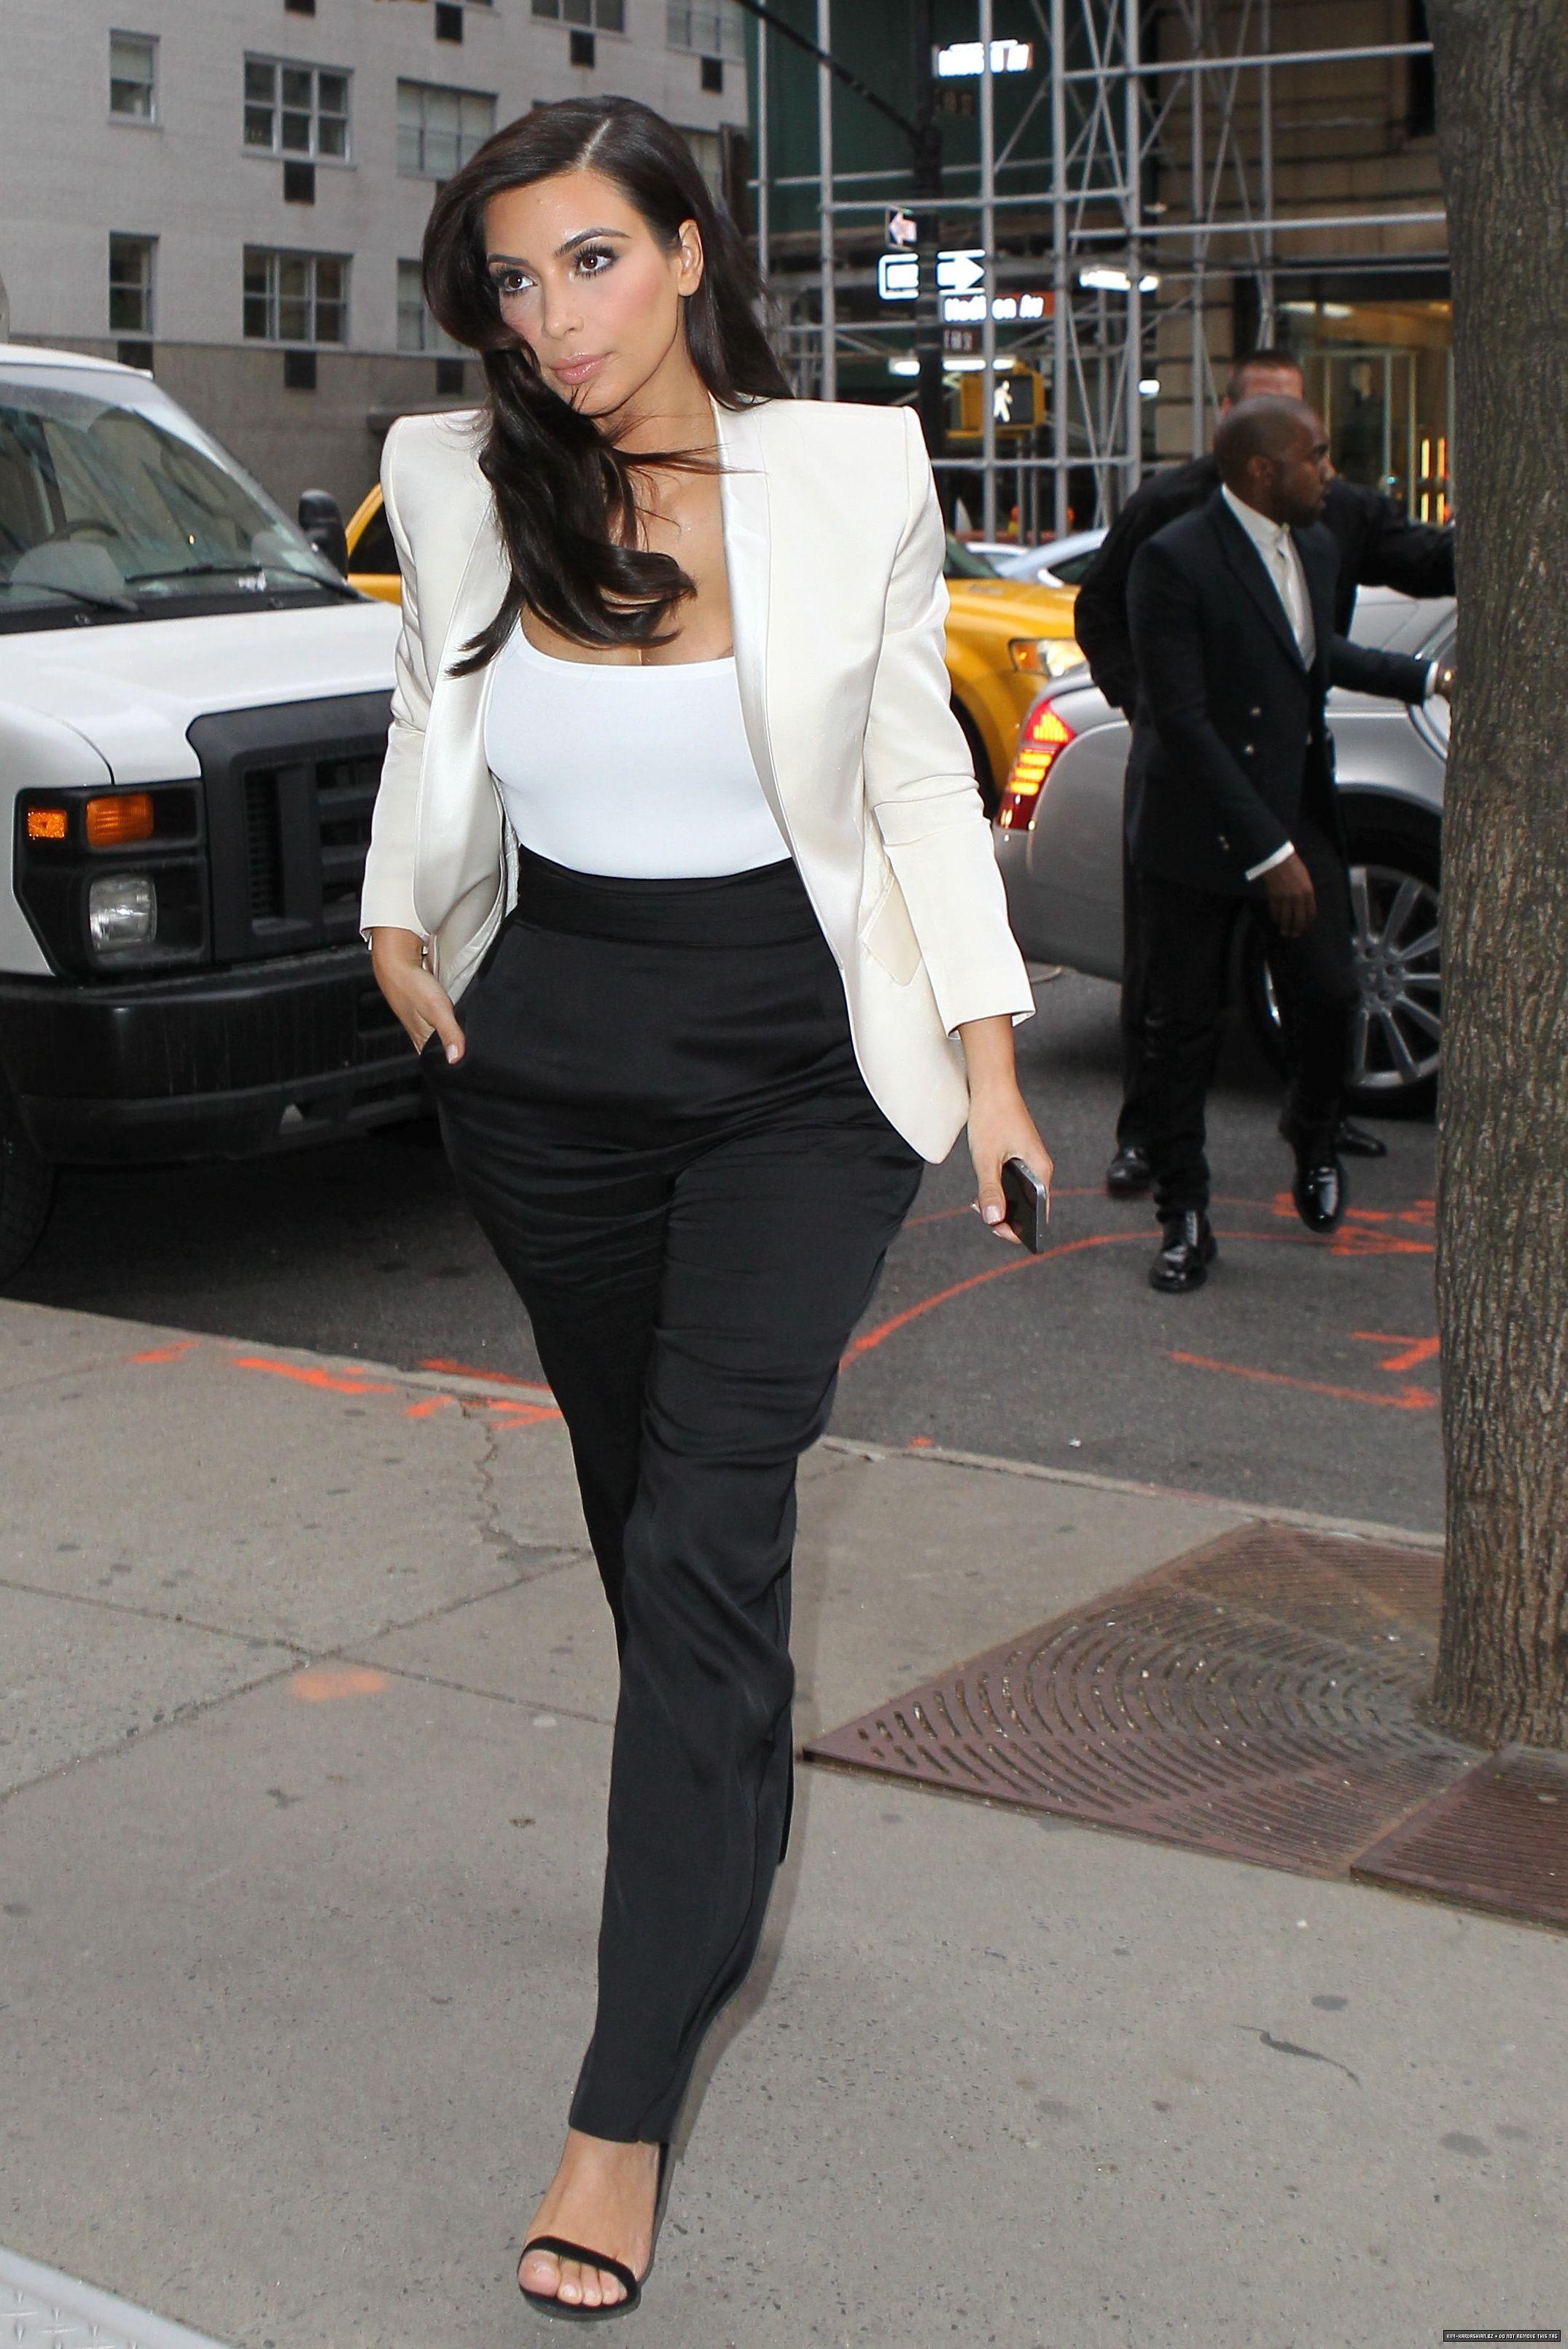 fa90df5212f Kim Kardashian Style